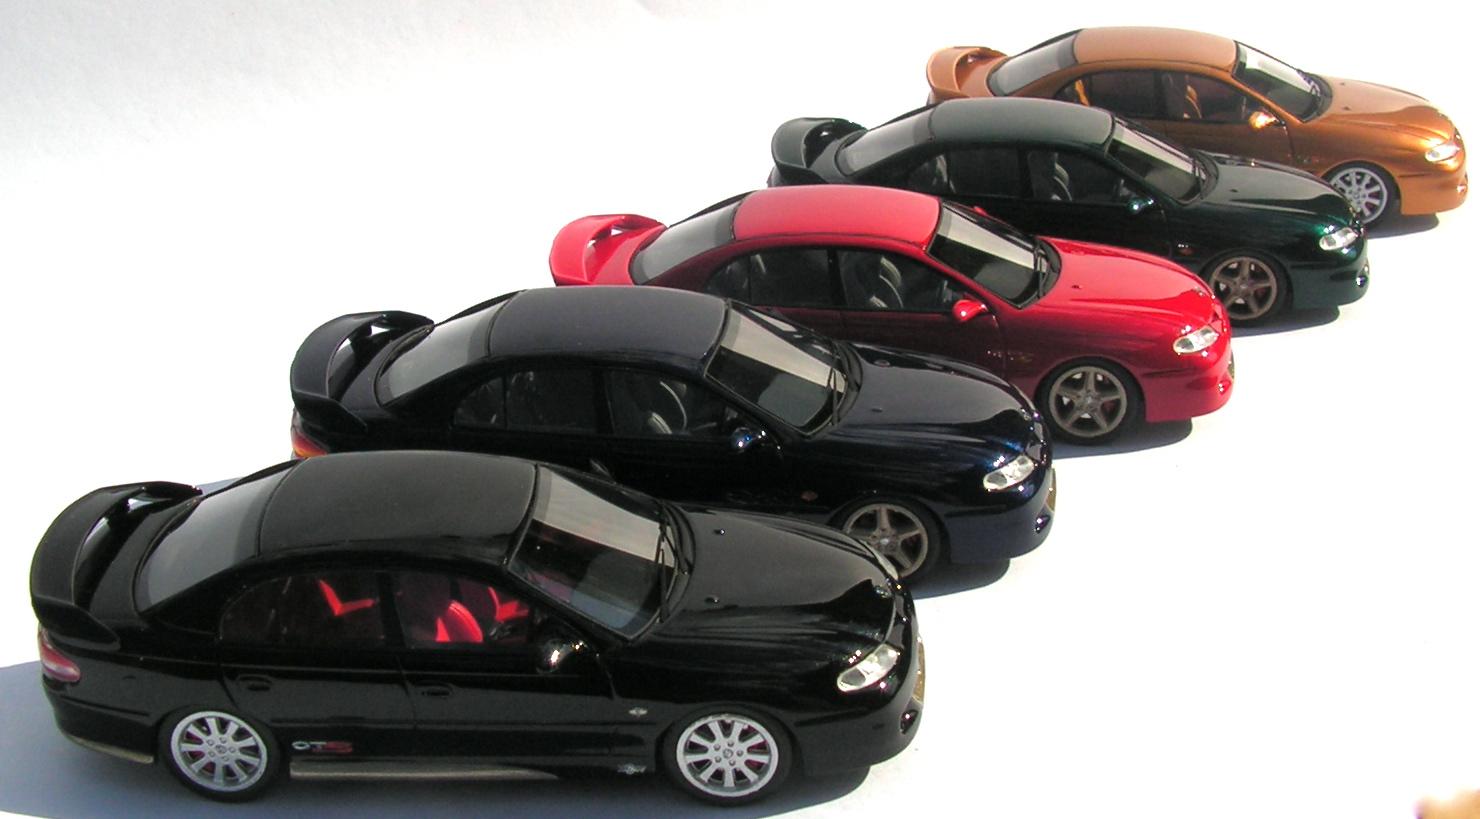 Capital diecast garage a resin revolution revolution for Garage mini monaco